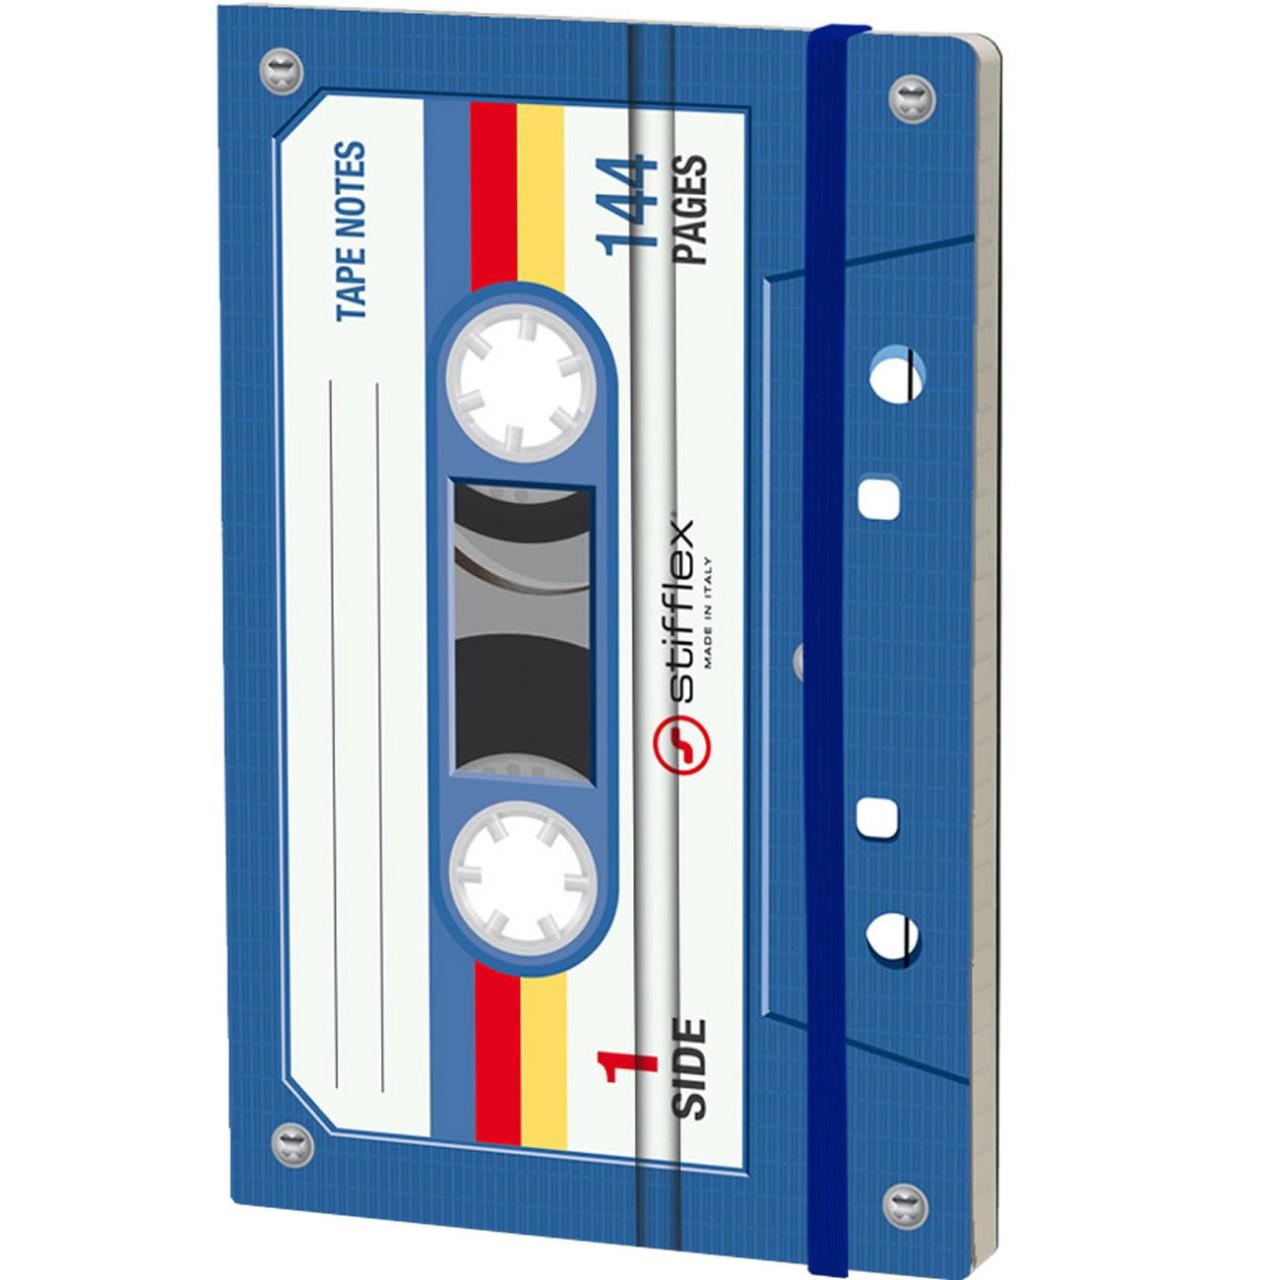 Stifflex Notizbuch MUSICASSETTE 9 x 14 cm 144 S.,  BLUE TAPE